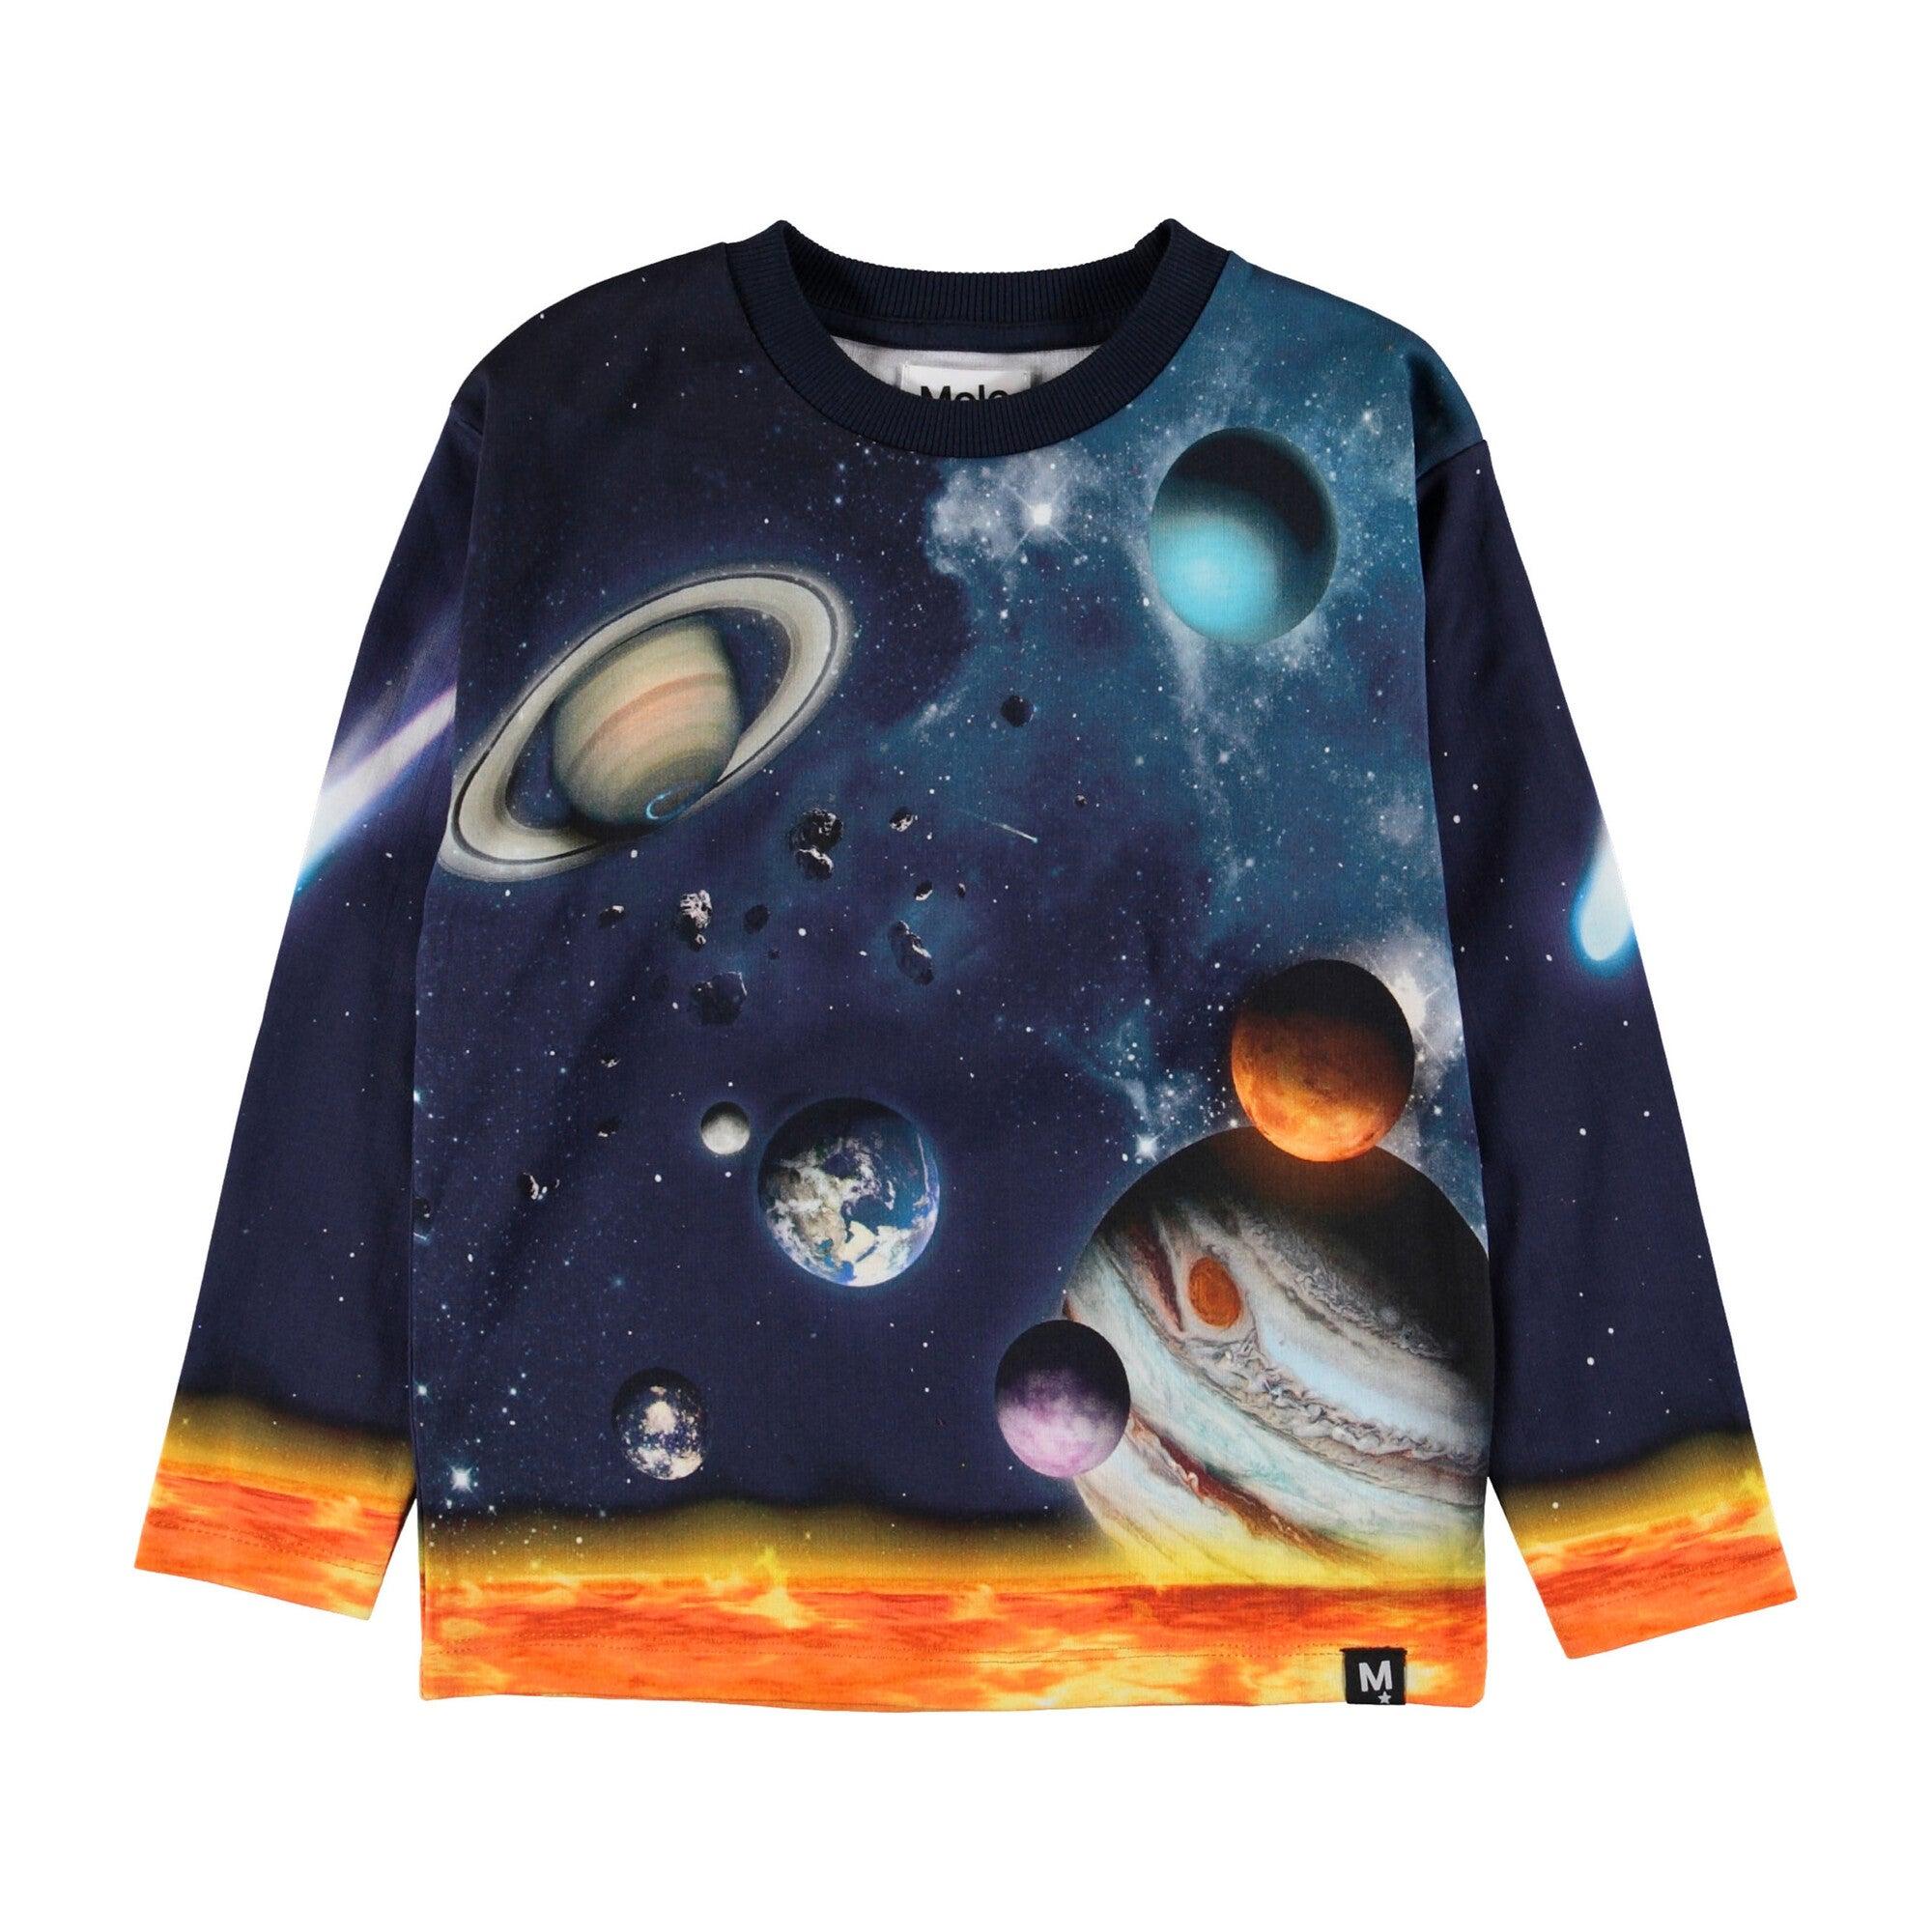 Mountoo Sweatshirt, Navy Blue